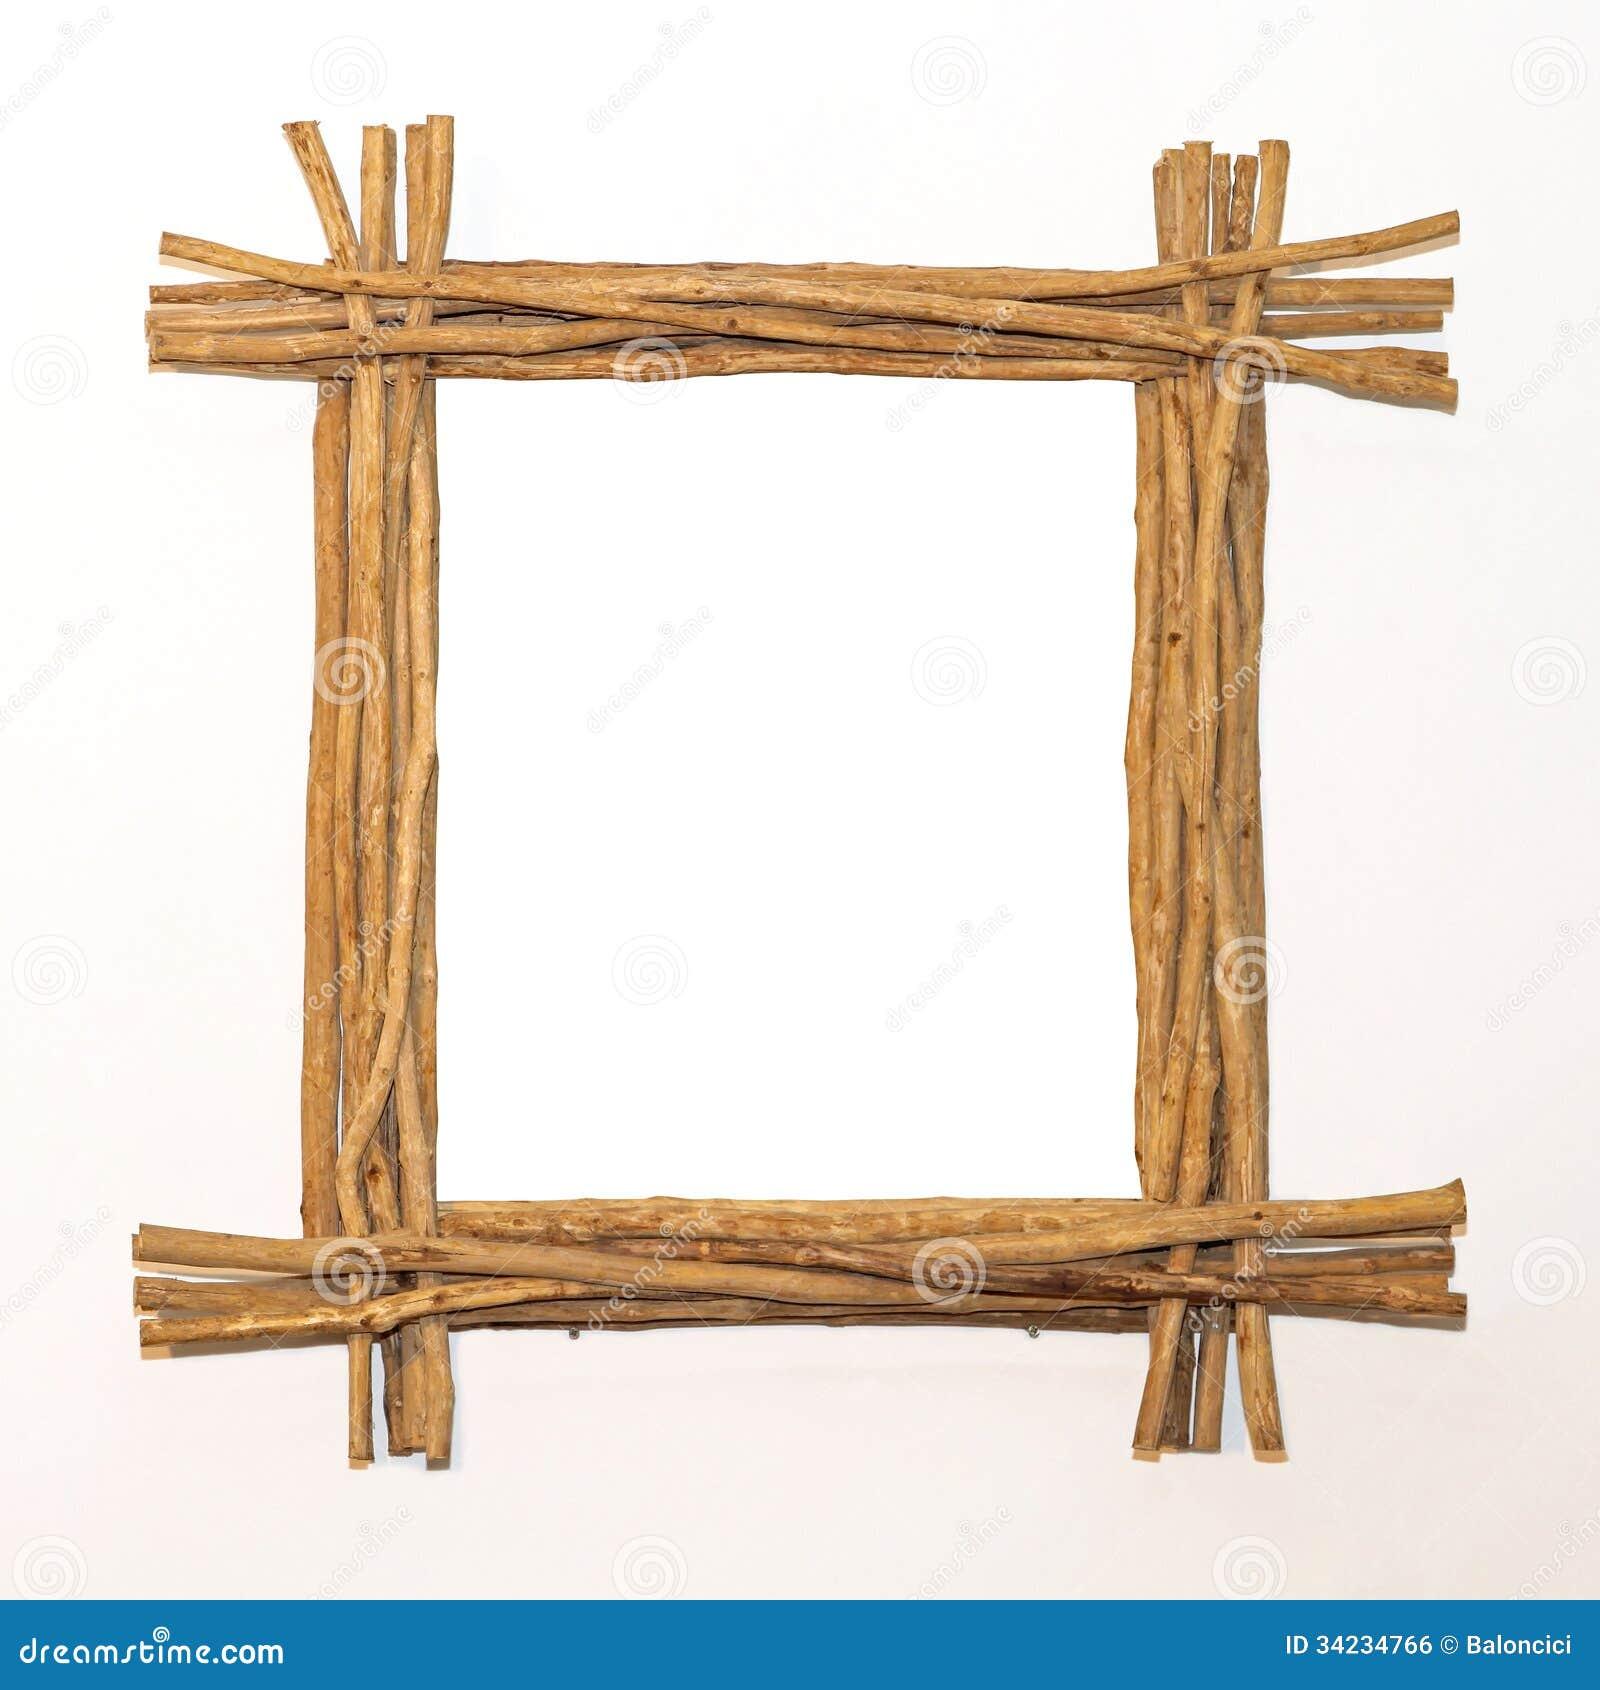 Wood sticks frame